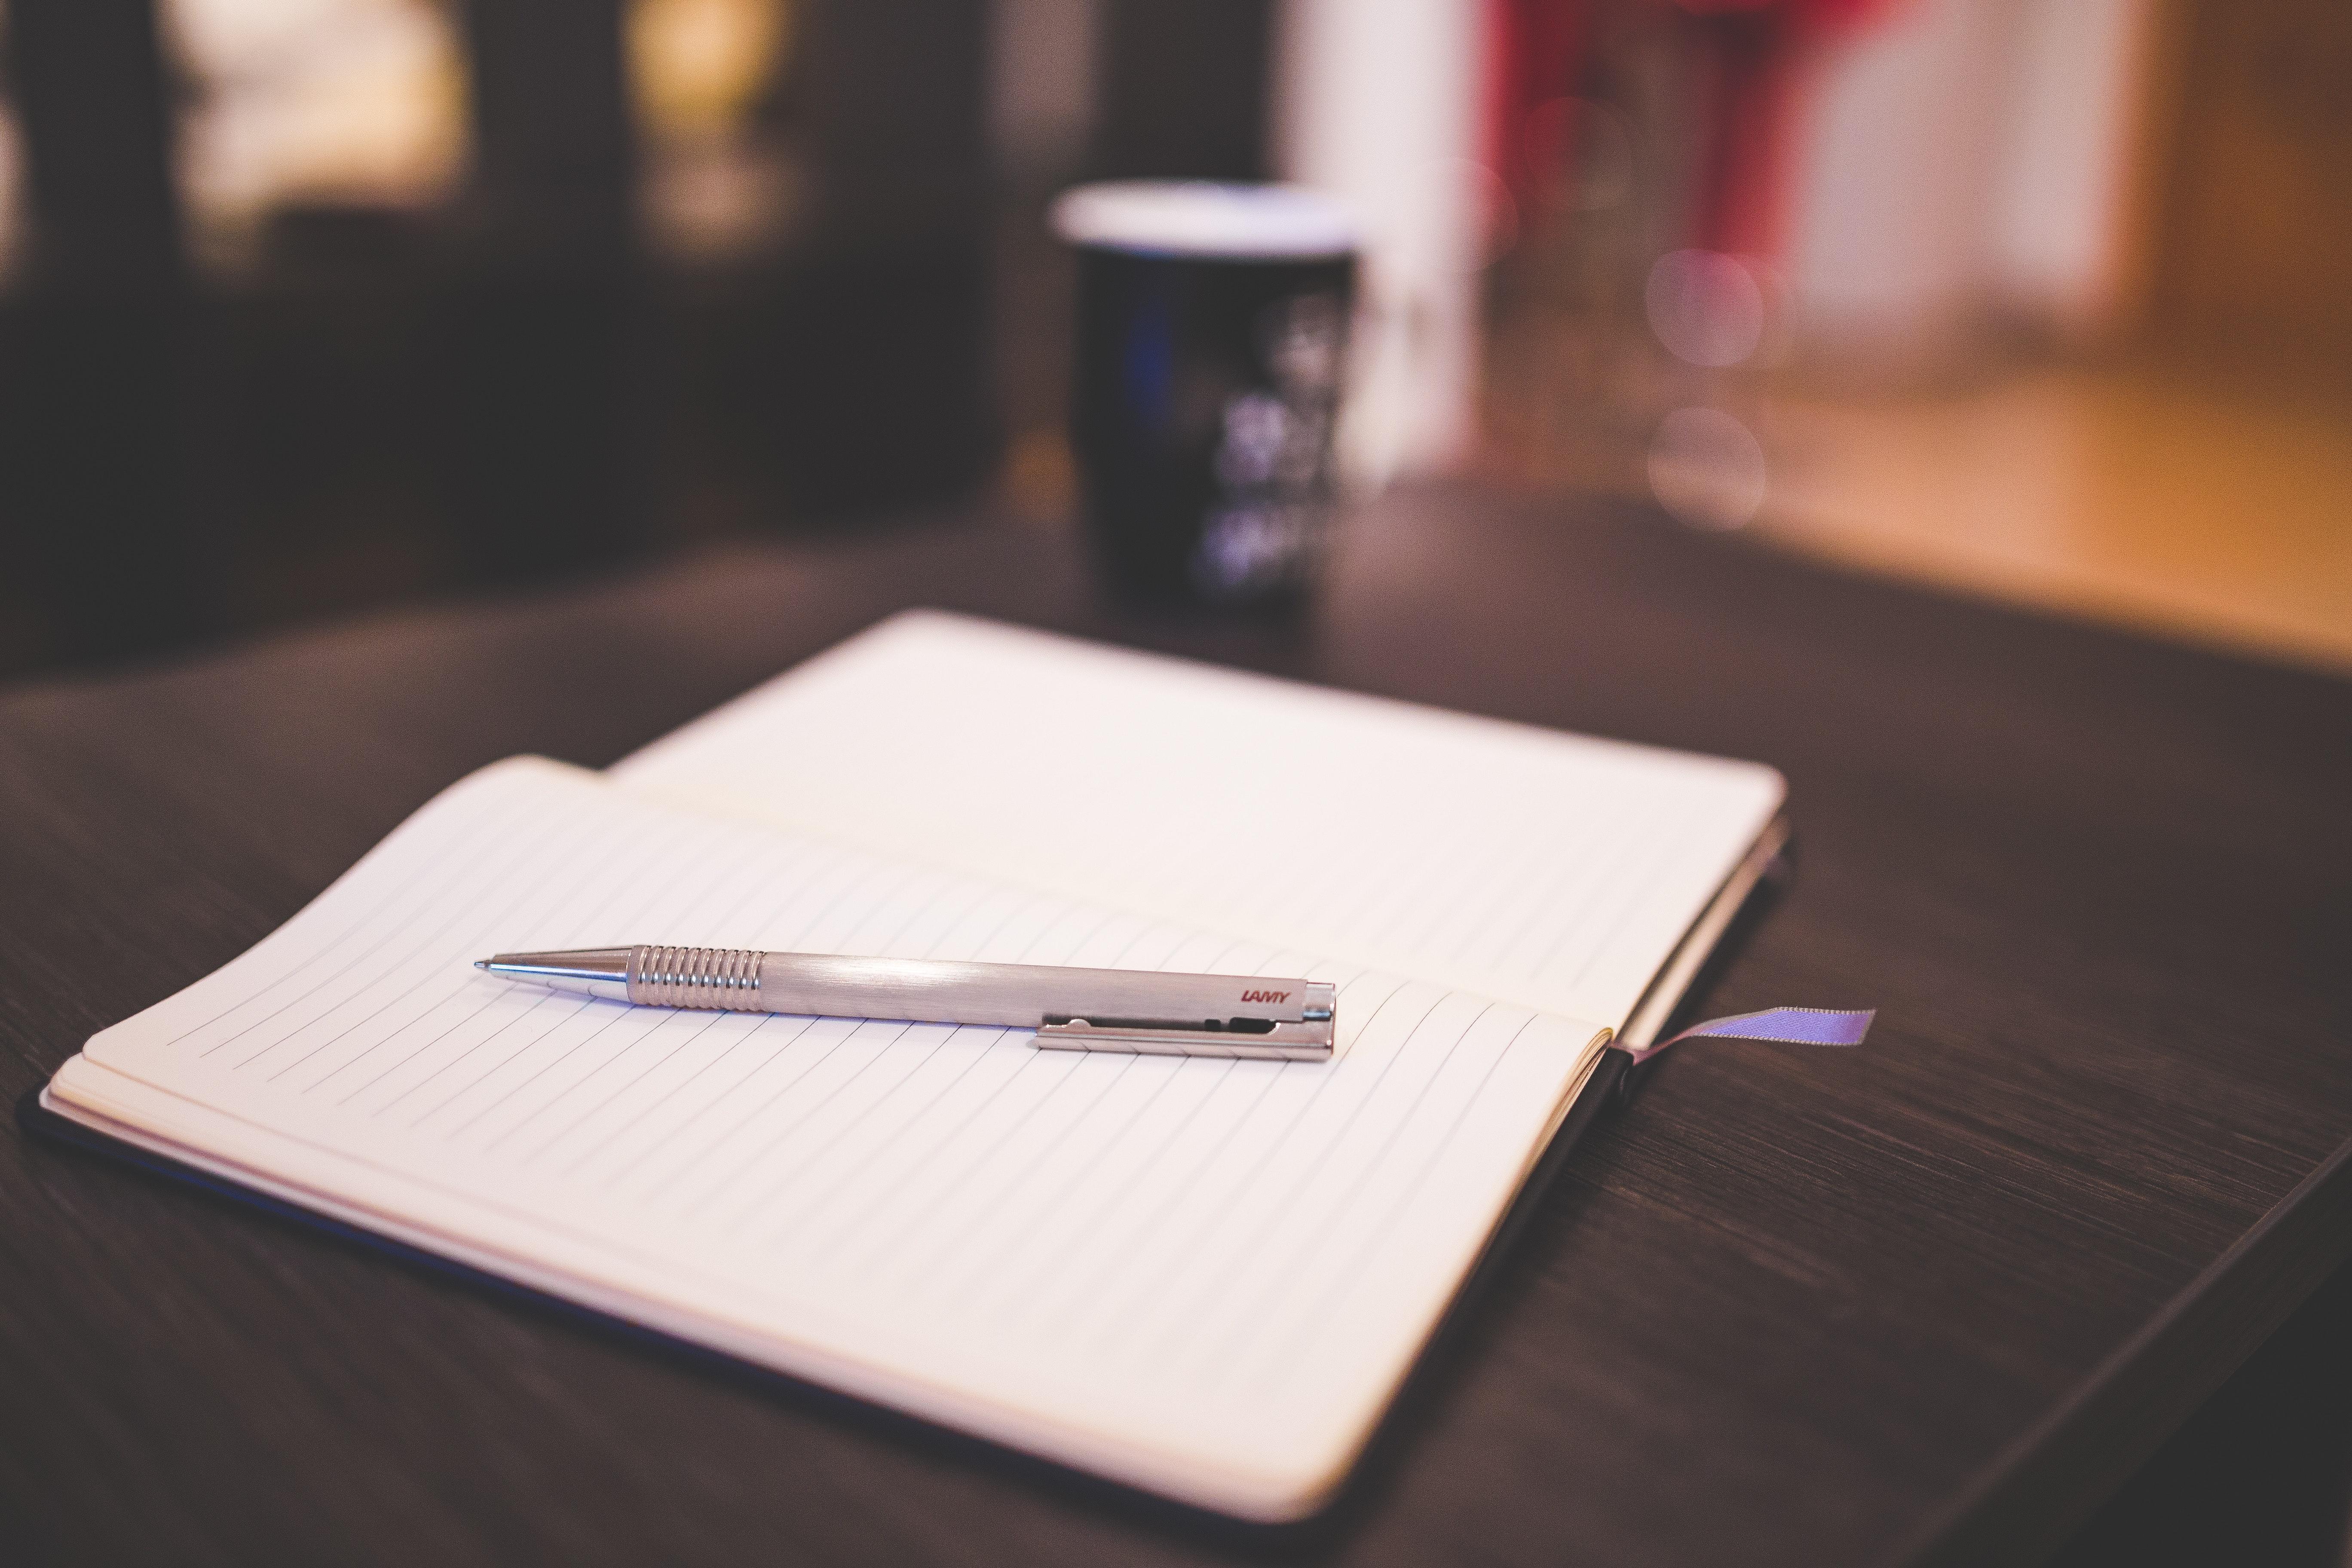 Grey push pen on white notebook photo